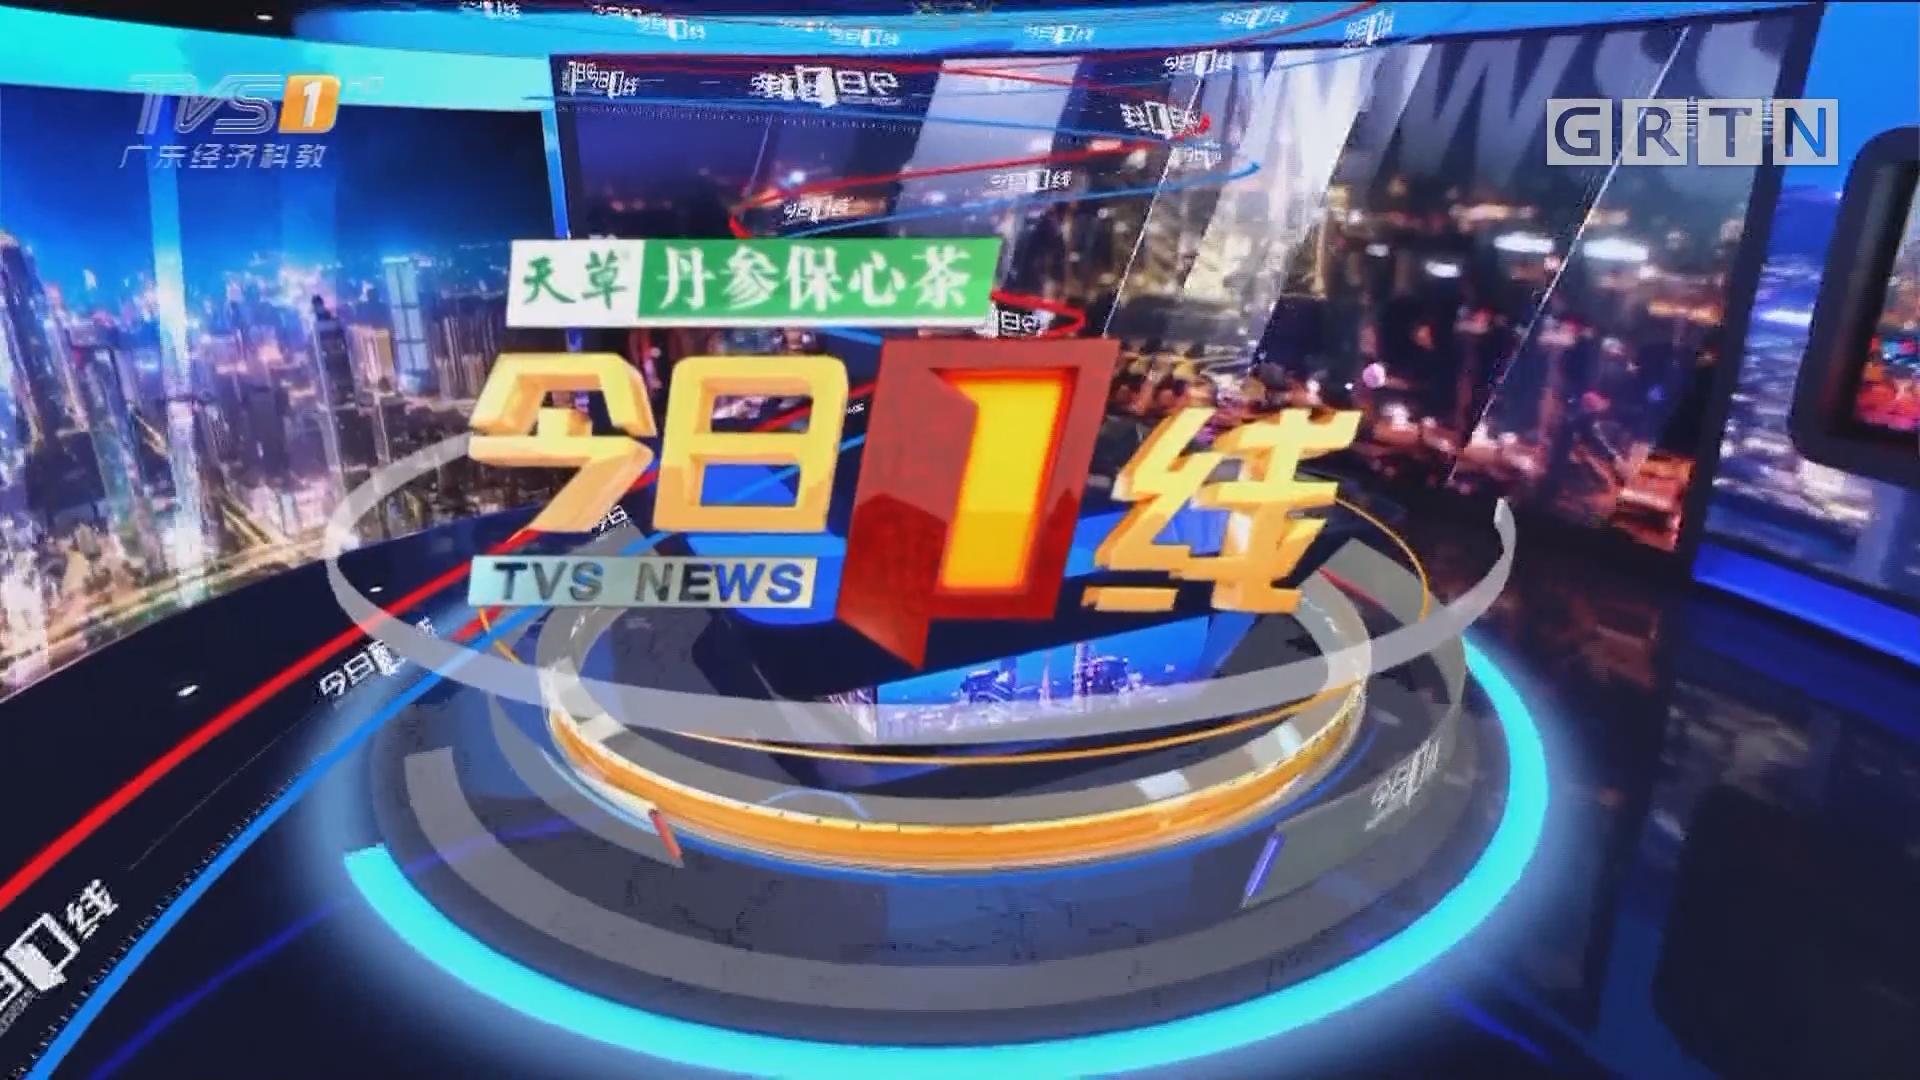 [HD][2019-03-29]今日一线:惠州惠城:小车冲破大桥护栏坠入江中 司机不幸身亡